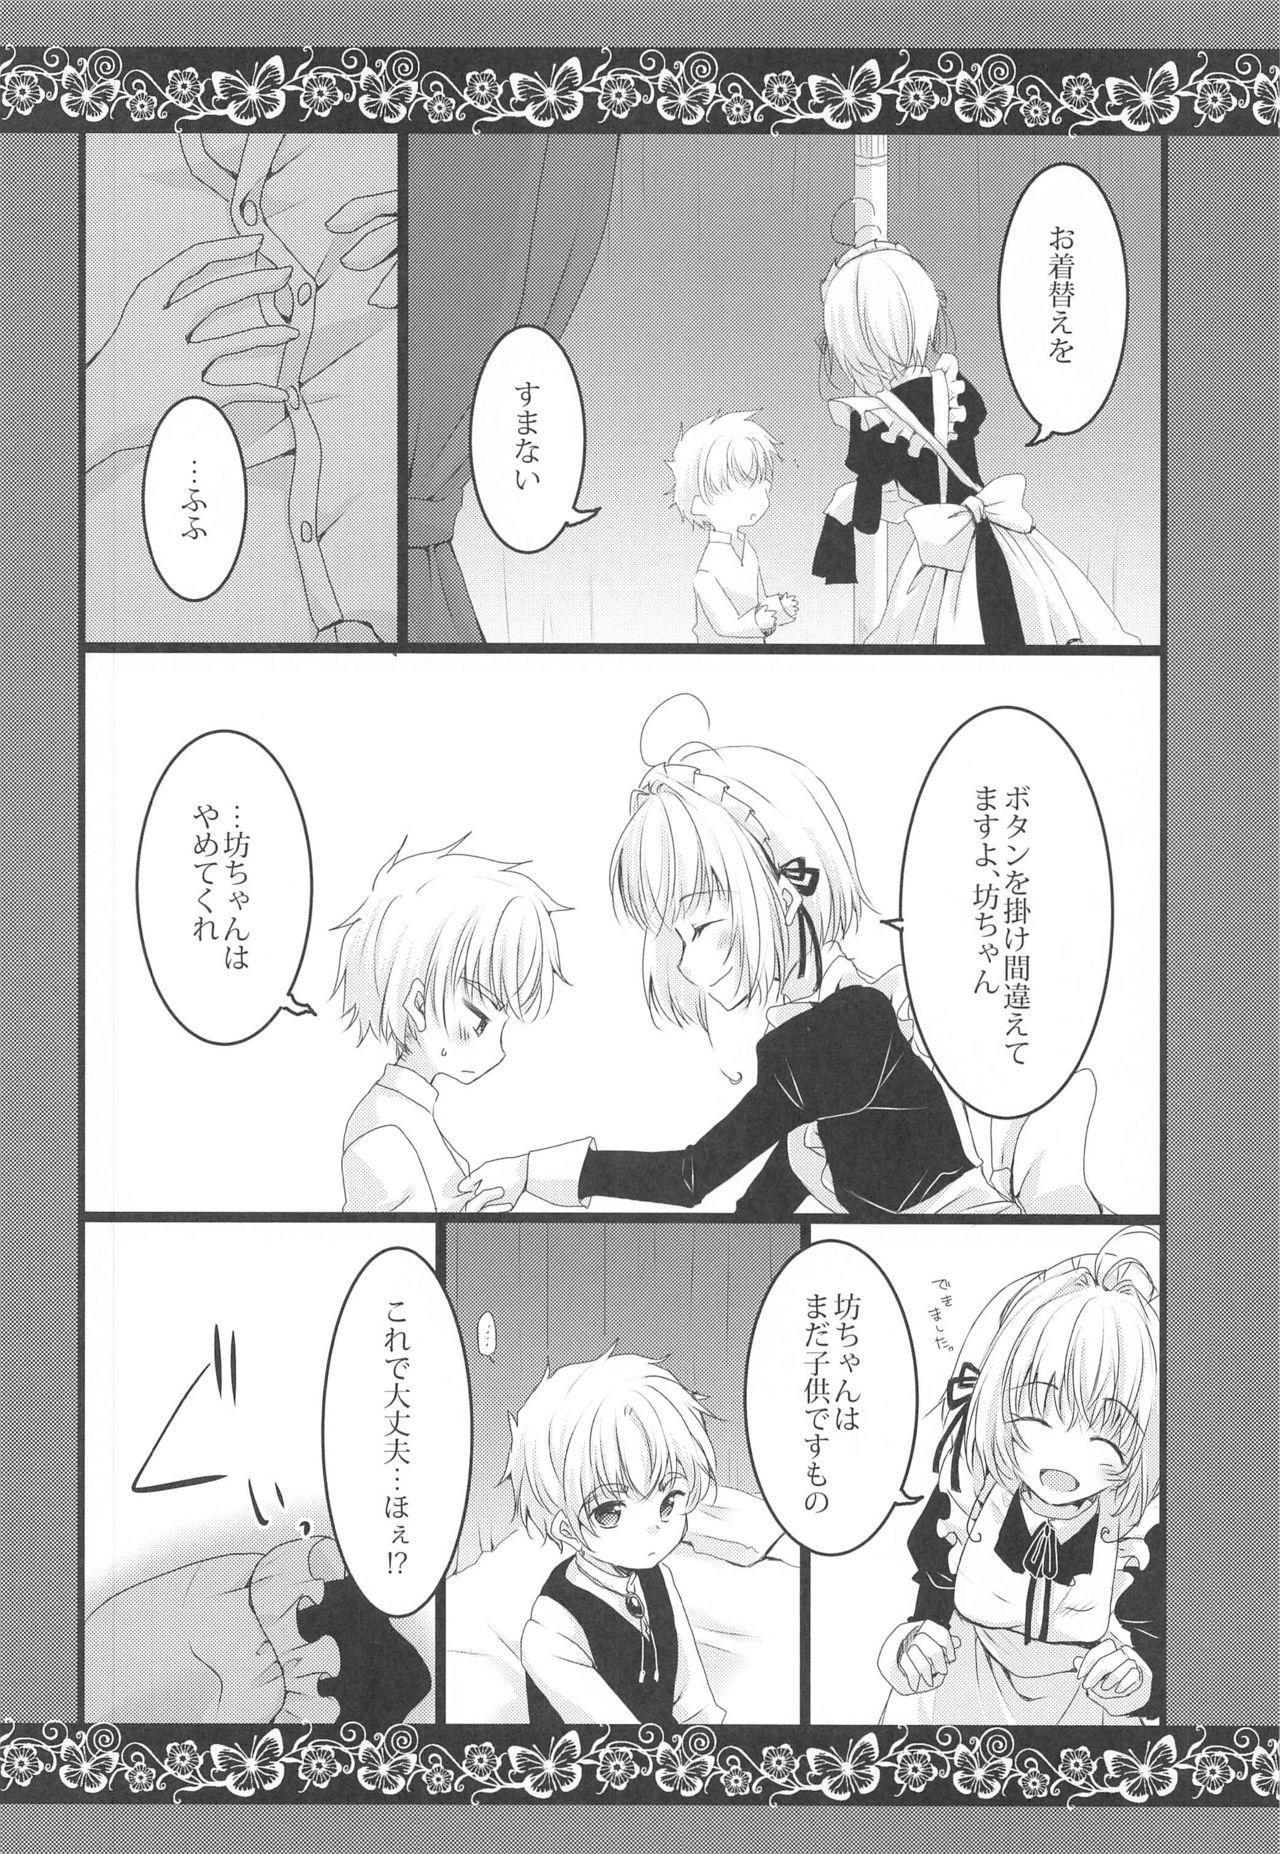 Maid to Goshujin-sama 4